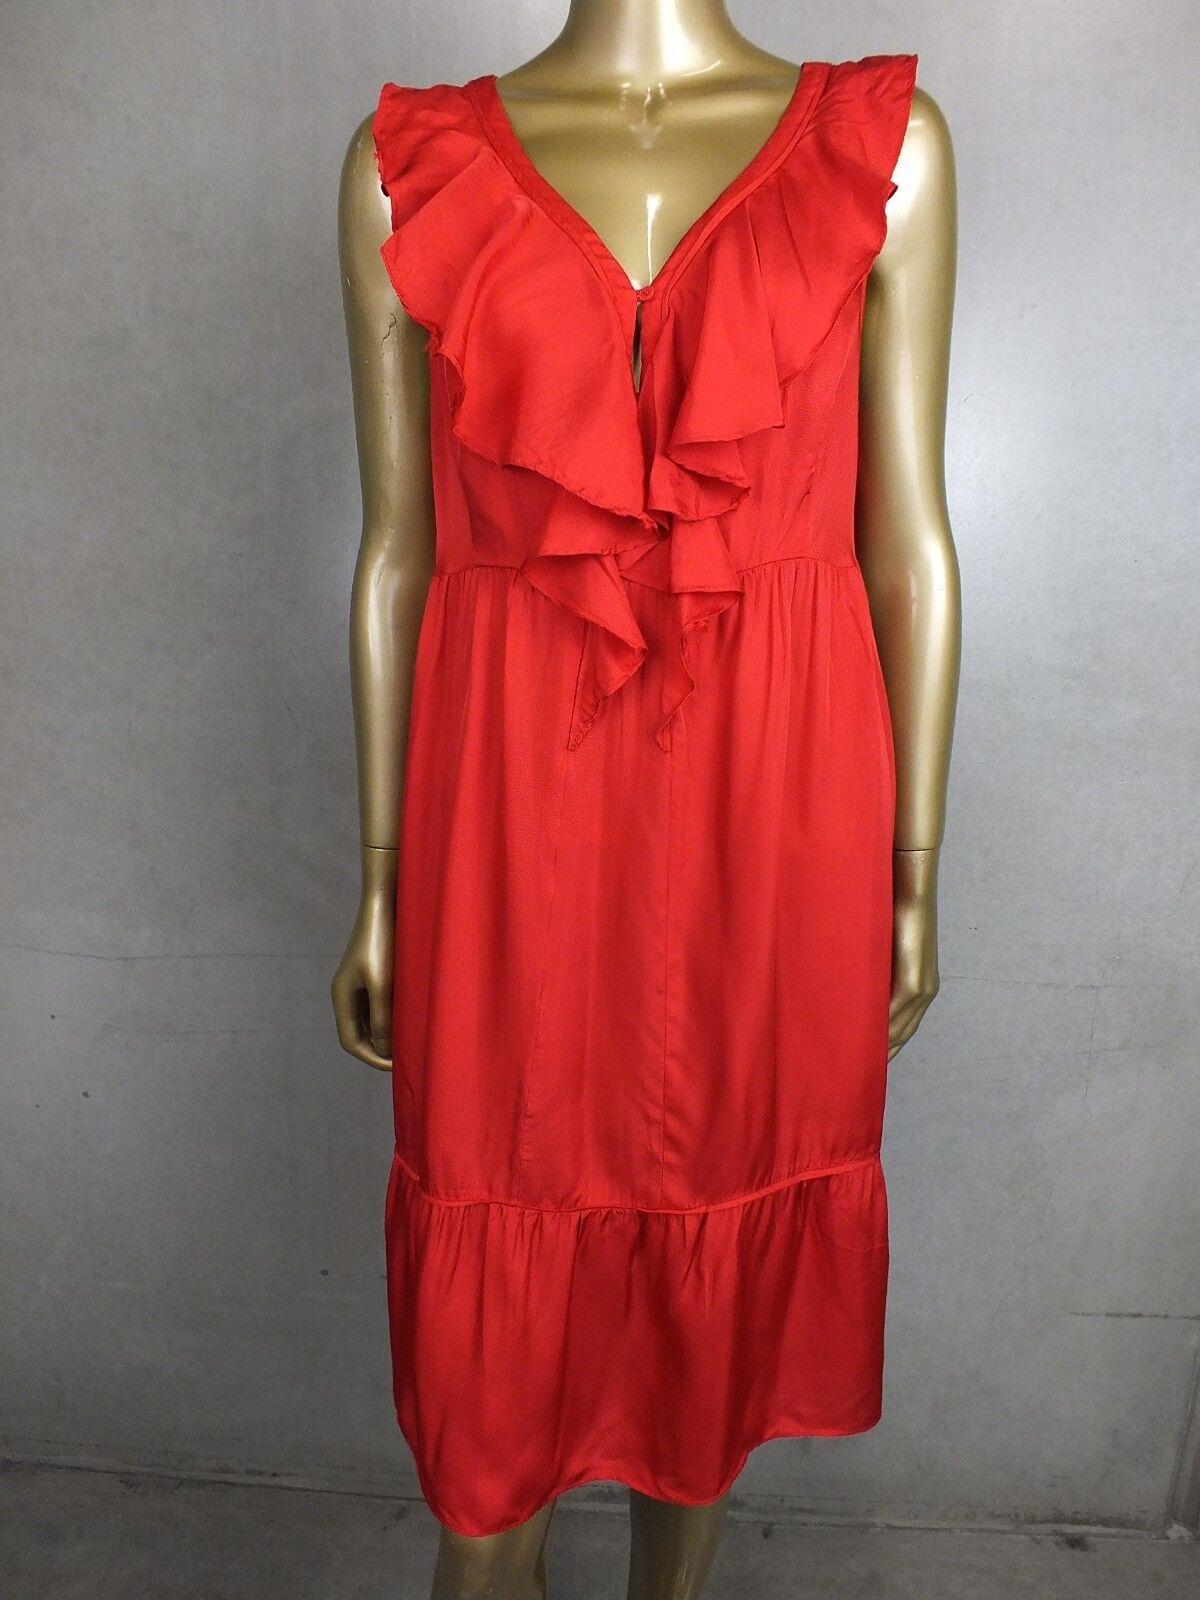 COUNTRY ROAD DRESS - RED RUFFLE FRILLS - TUNIC SKIRT DRESS - SIZE LARGE